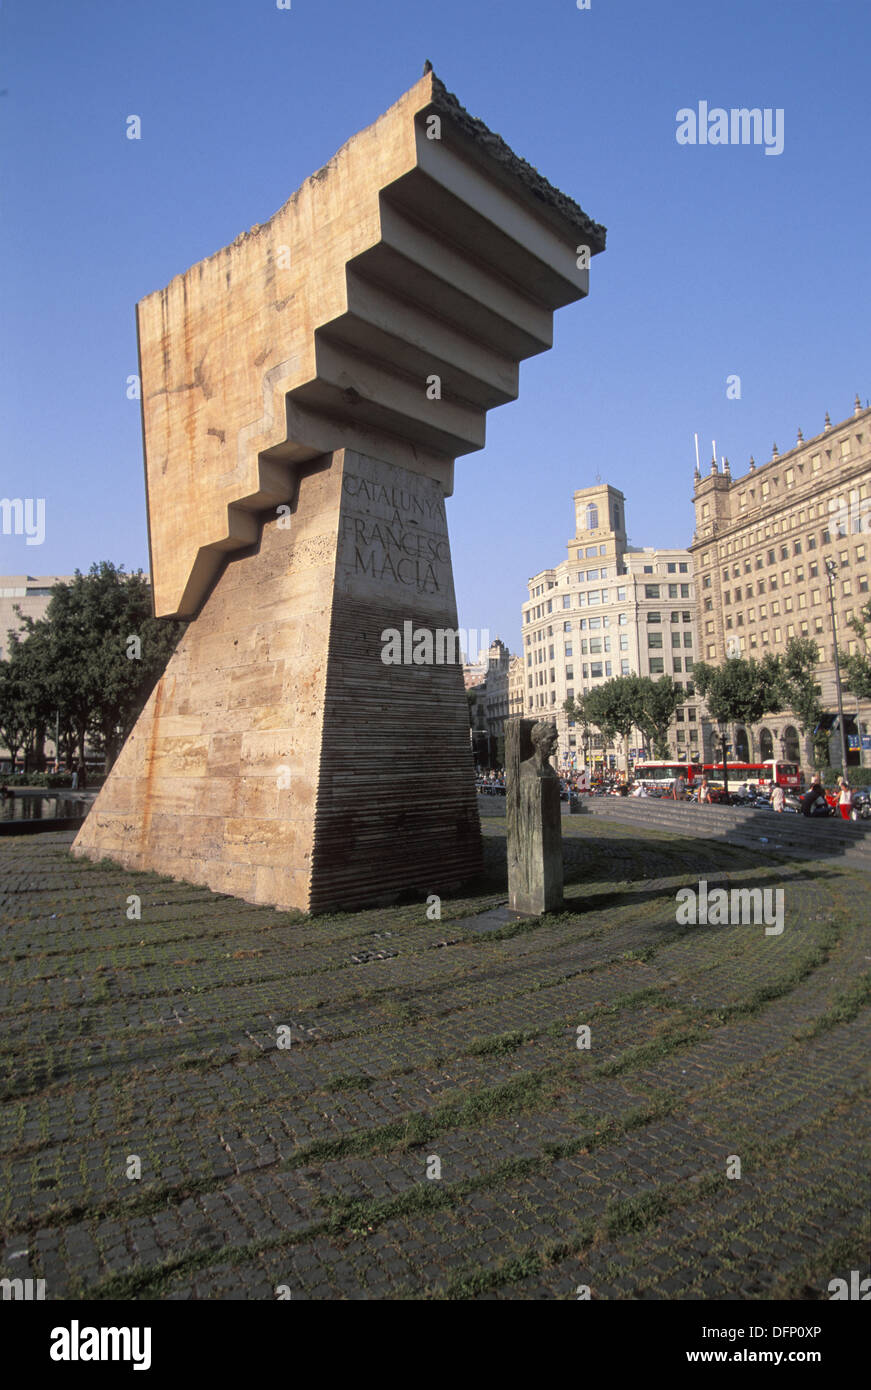 Monument to Catalan political leader Francesc Macià by sculptor Josep Maria Subirachs at Plaça de Catalunya. Barcelona, Spain - Stock Image